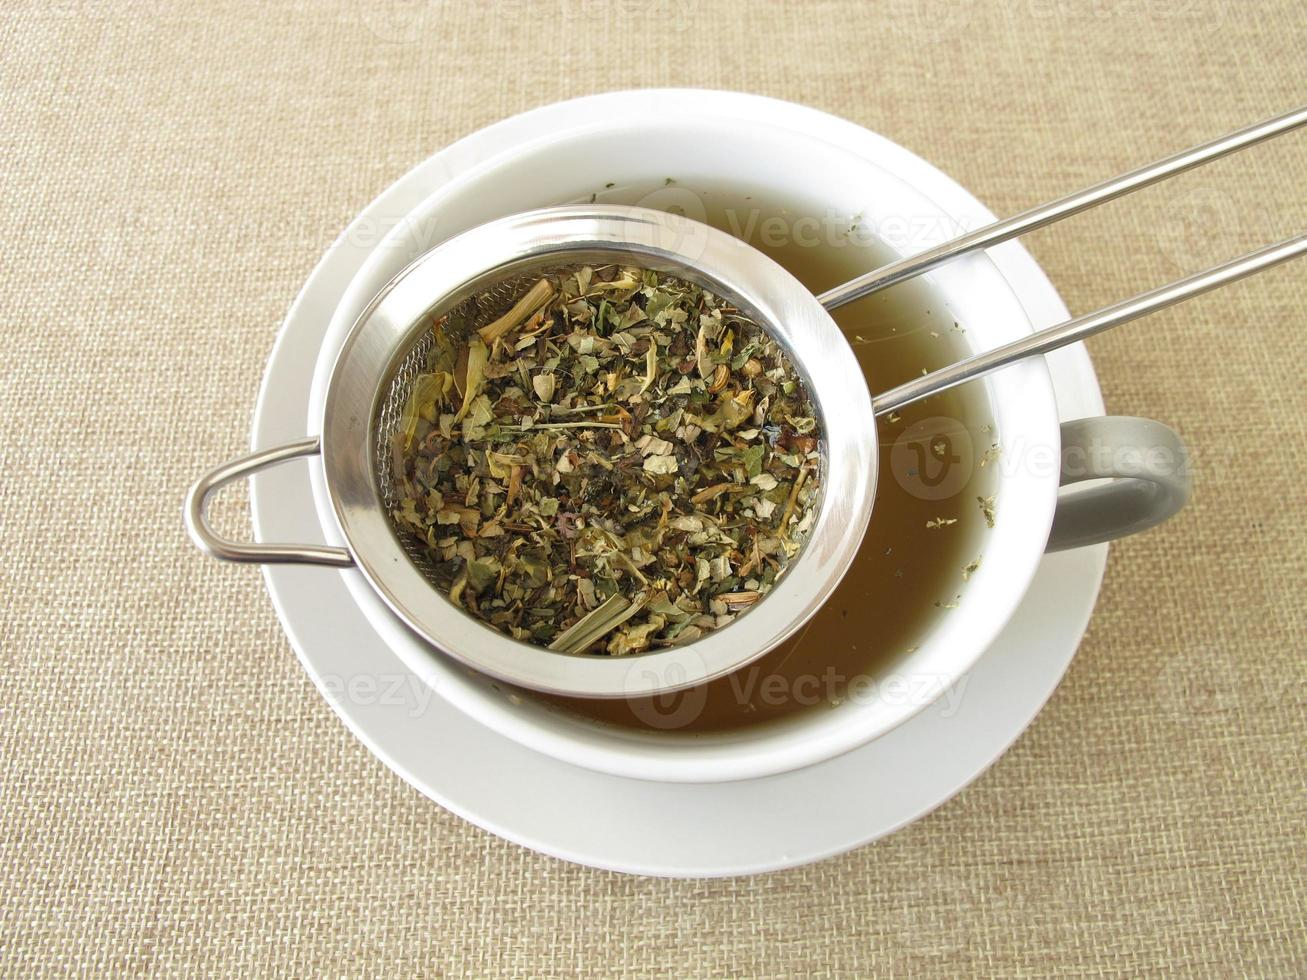 té de hierbas en colador de té foto